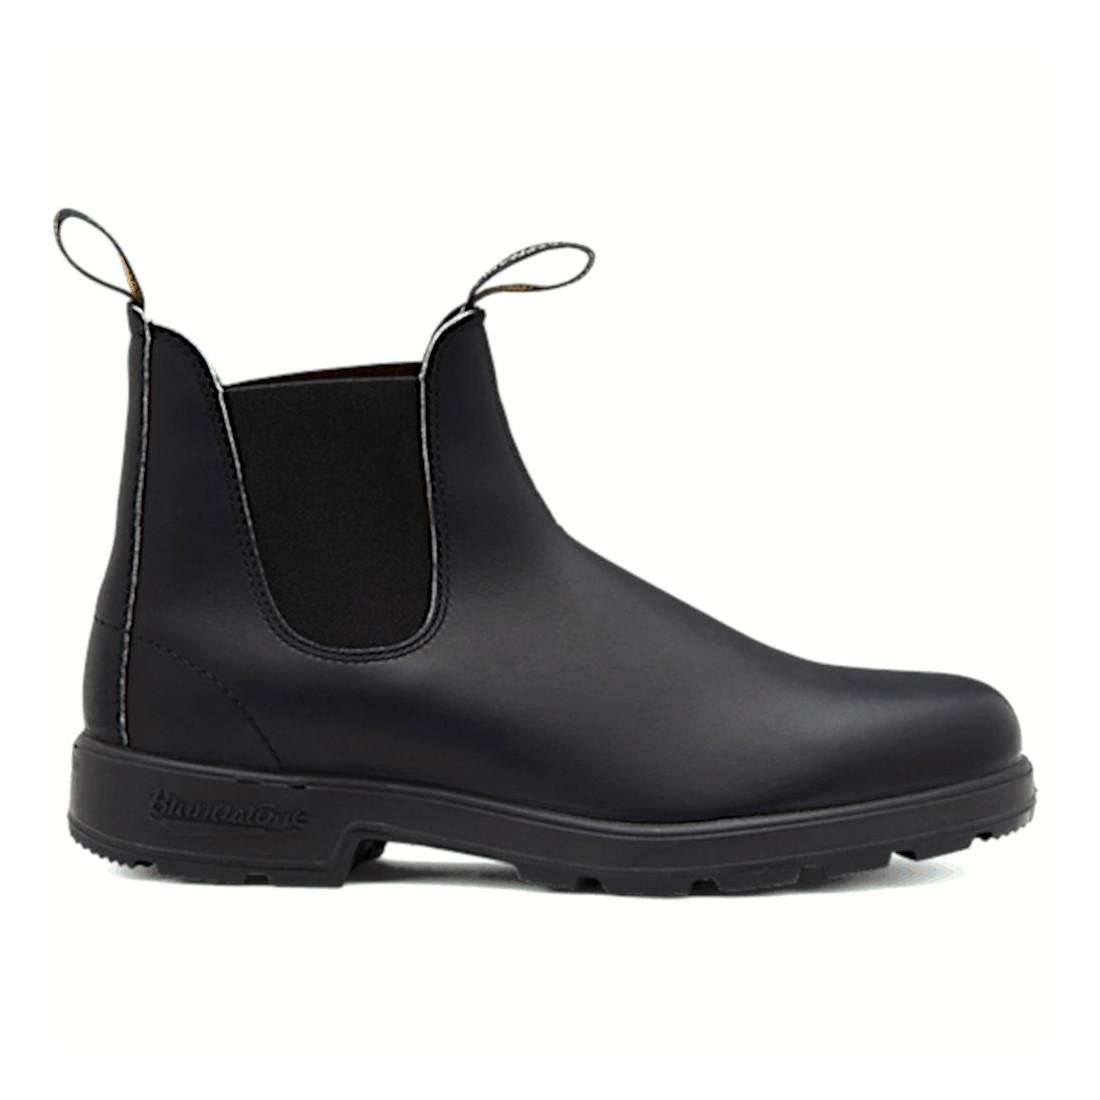 stiefeletten herren blundstone bccal0012 510el side boot 591